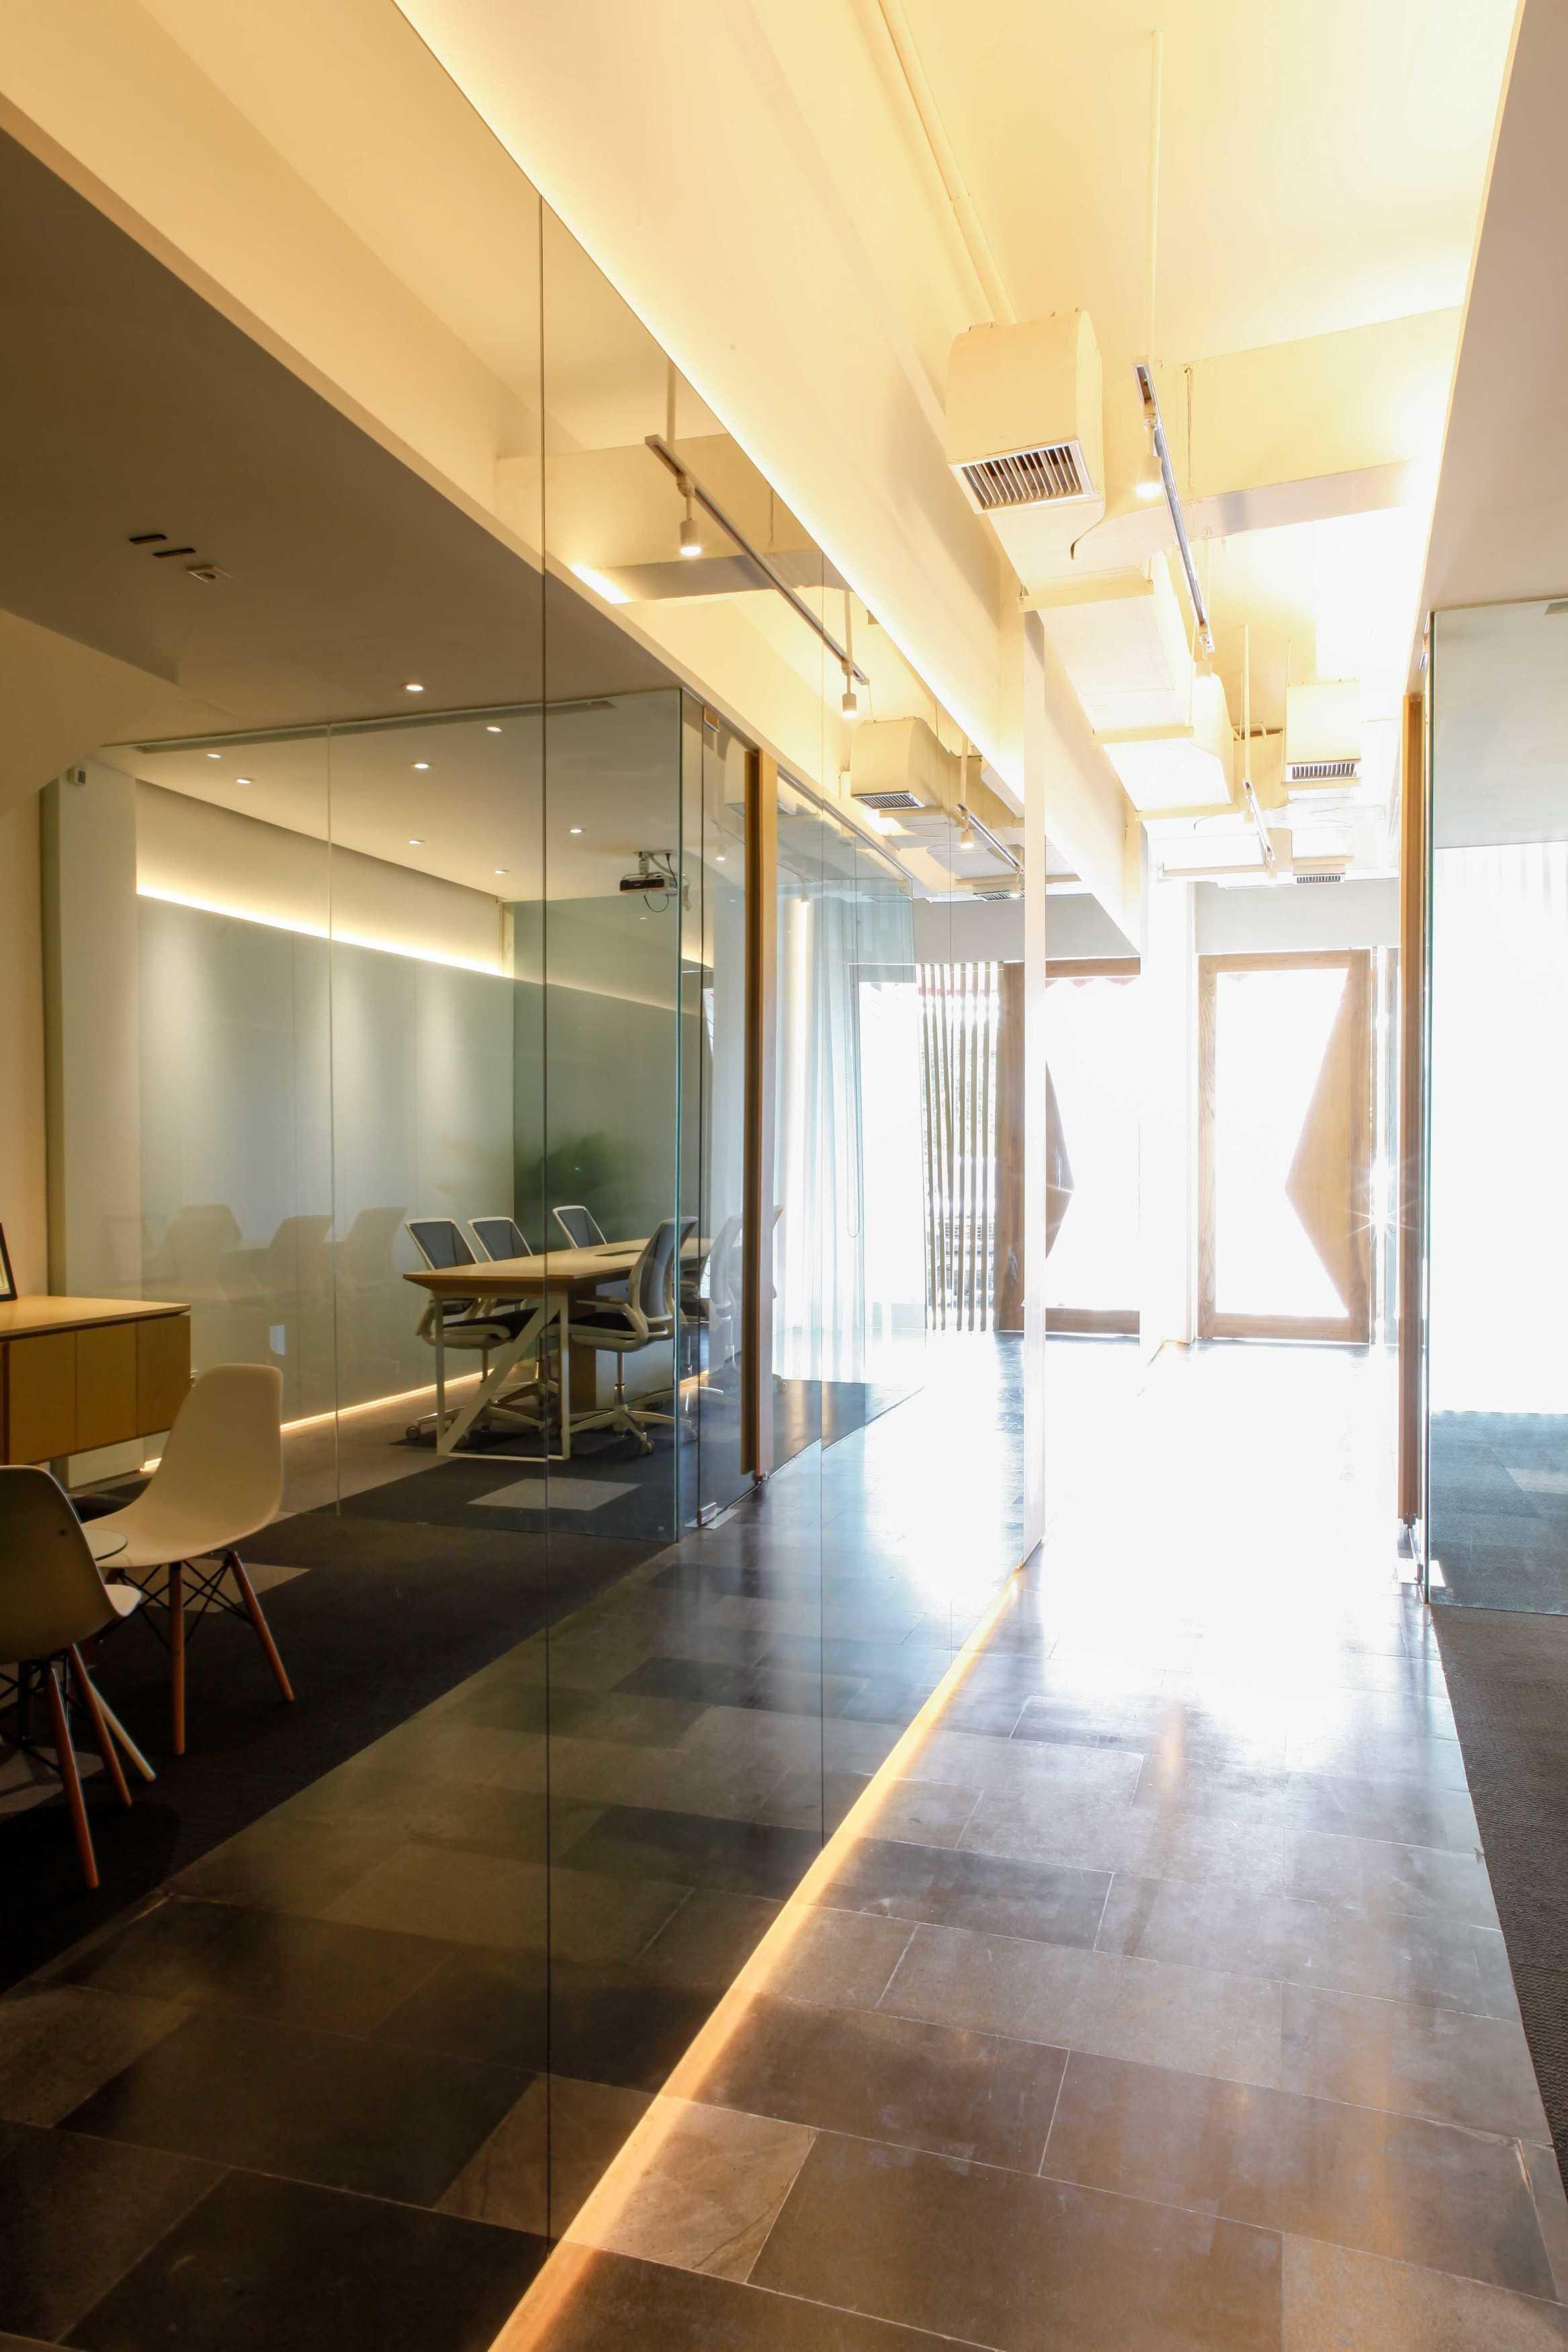 Design Intervention Simland Office Jakarta, Daerah Khusus Ibukota Jakarta, Indonesia Jakarta, Daerah Khusus Ibukota Jakarta, Indonesia Design-Intervention-Simland-Office   71056